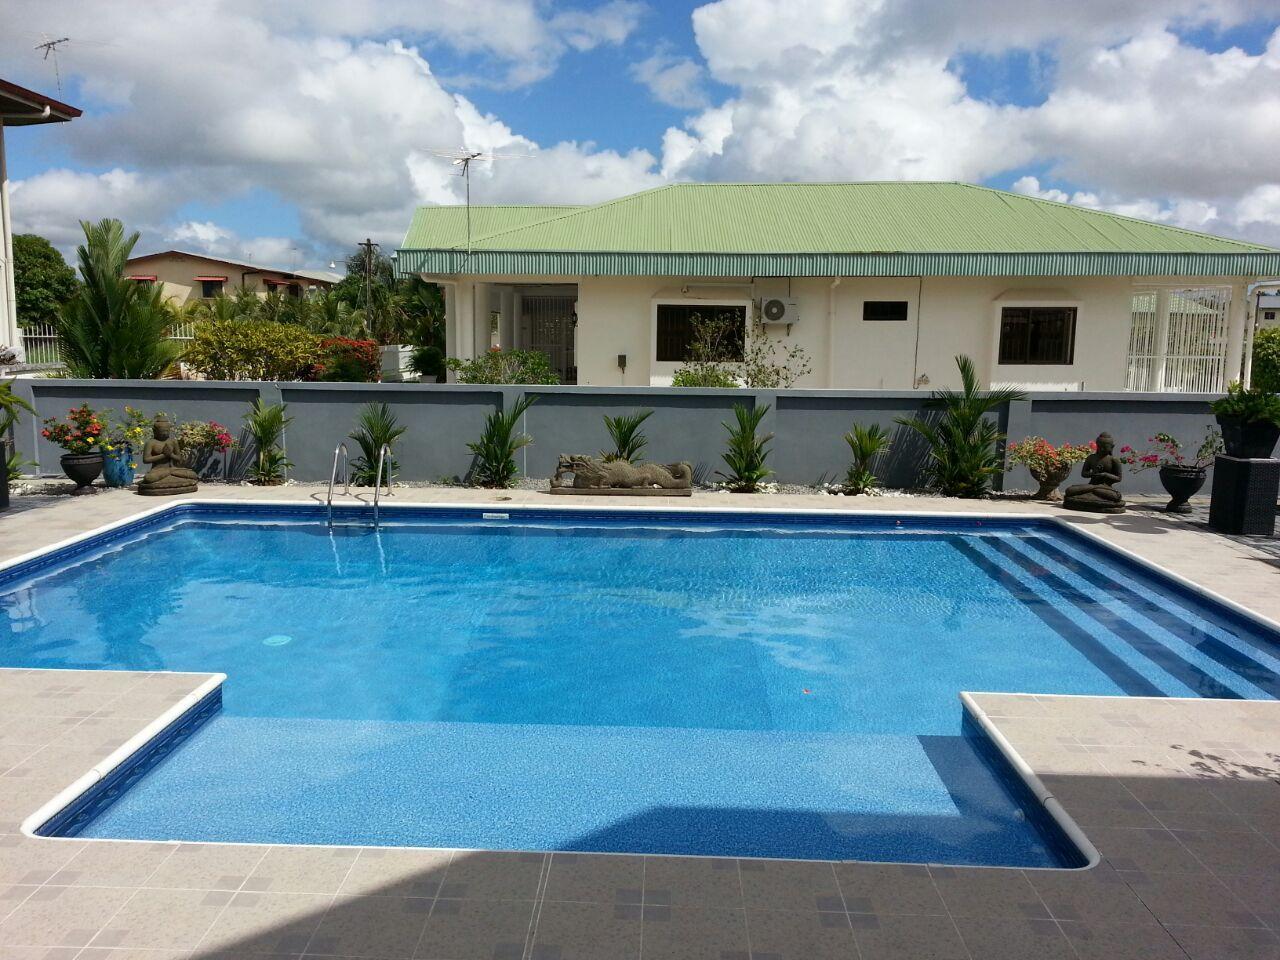 A 6 Radius Rectangle Inground Swimming Pool With Custom Wall To